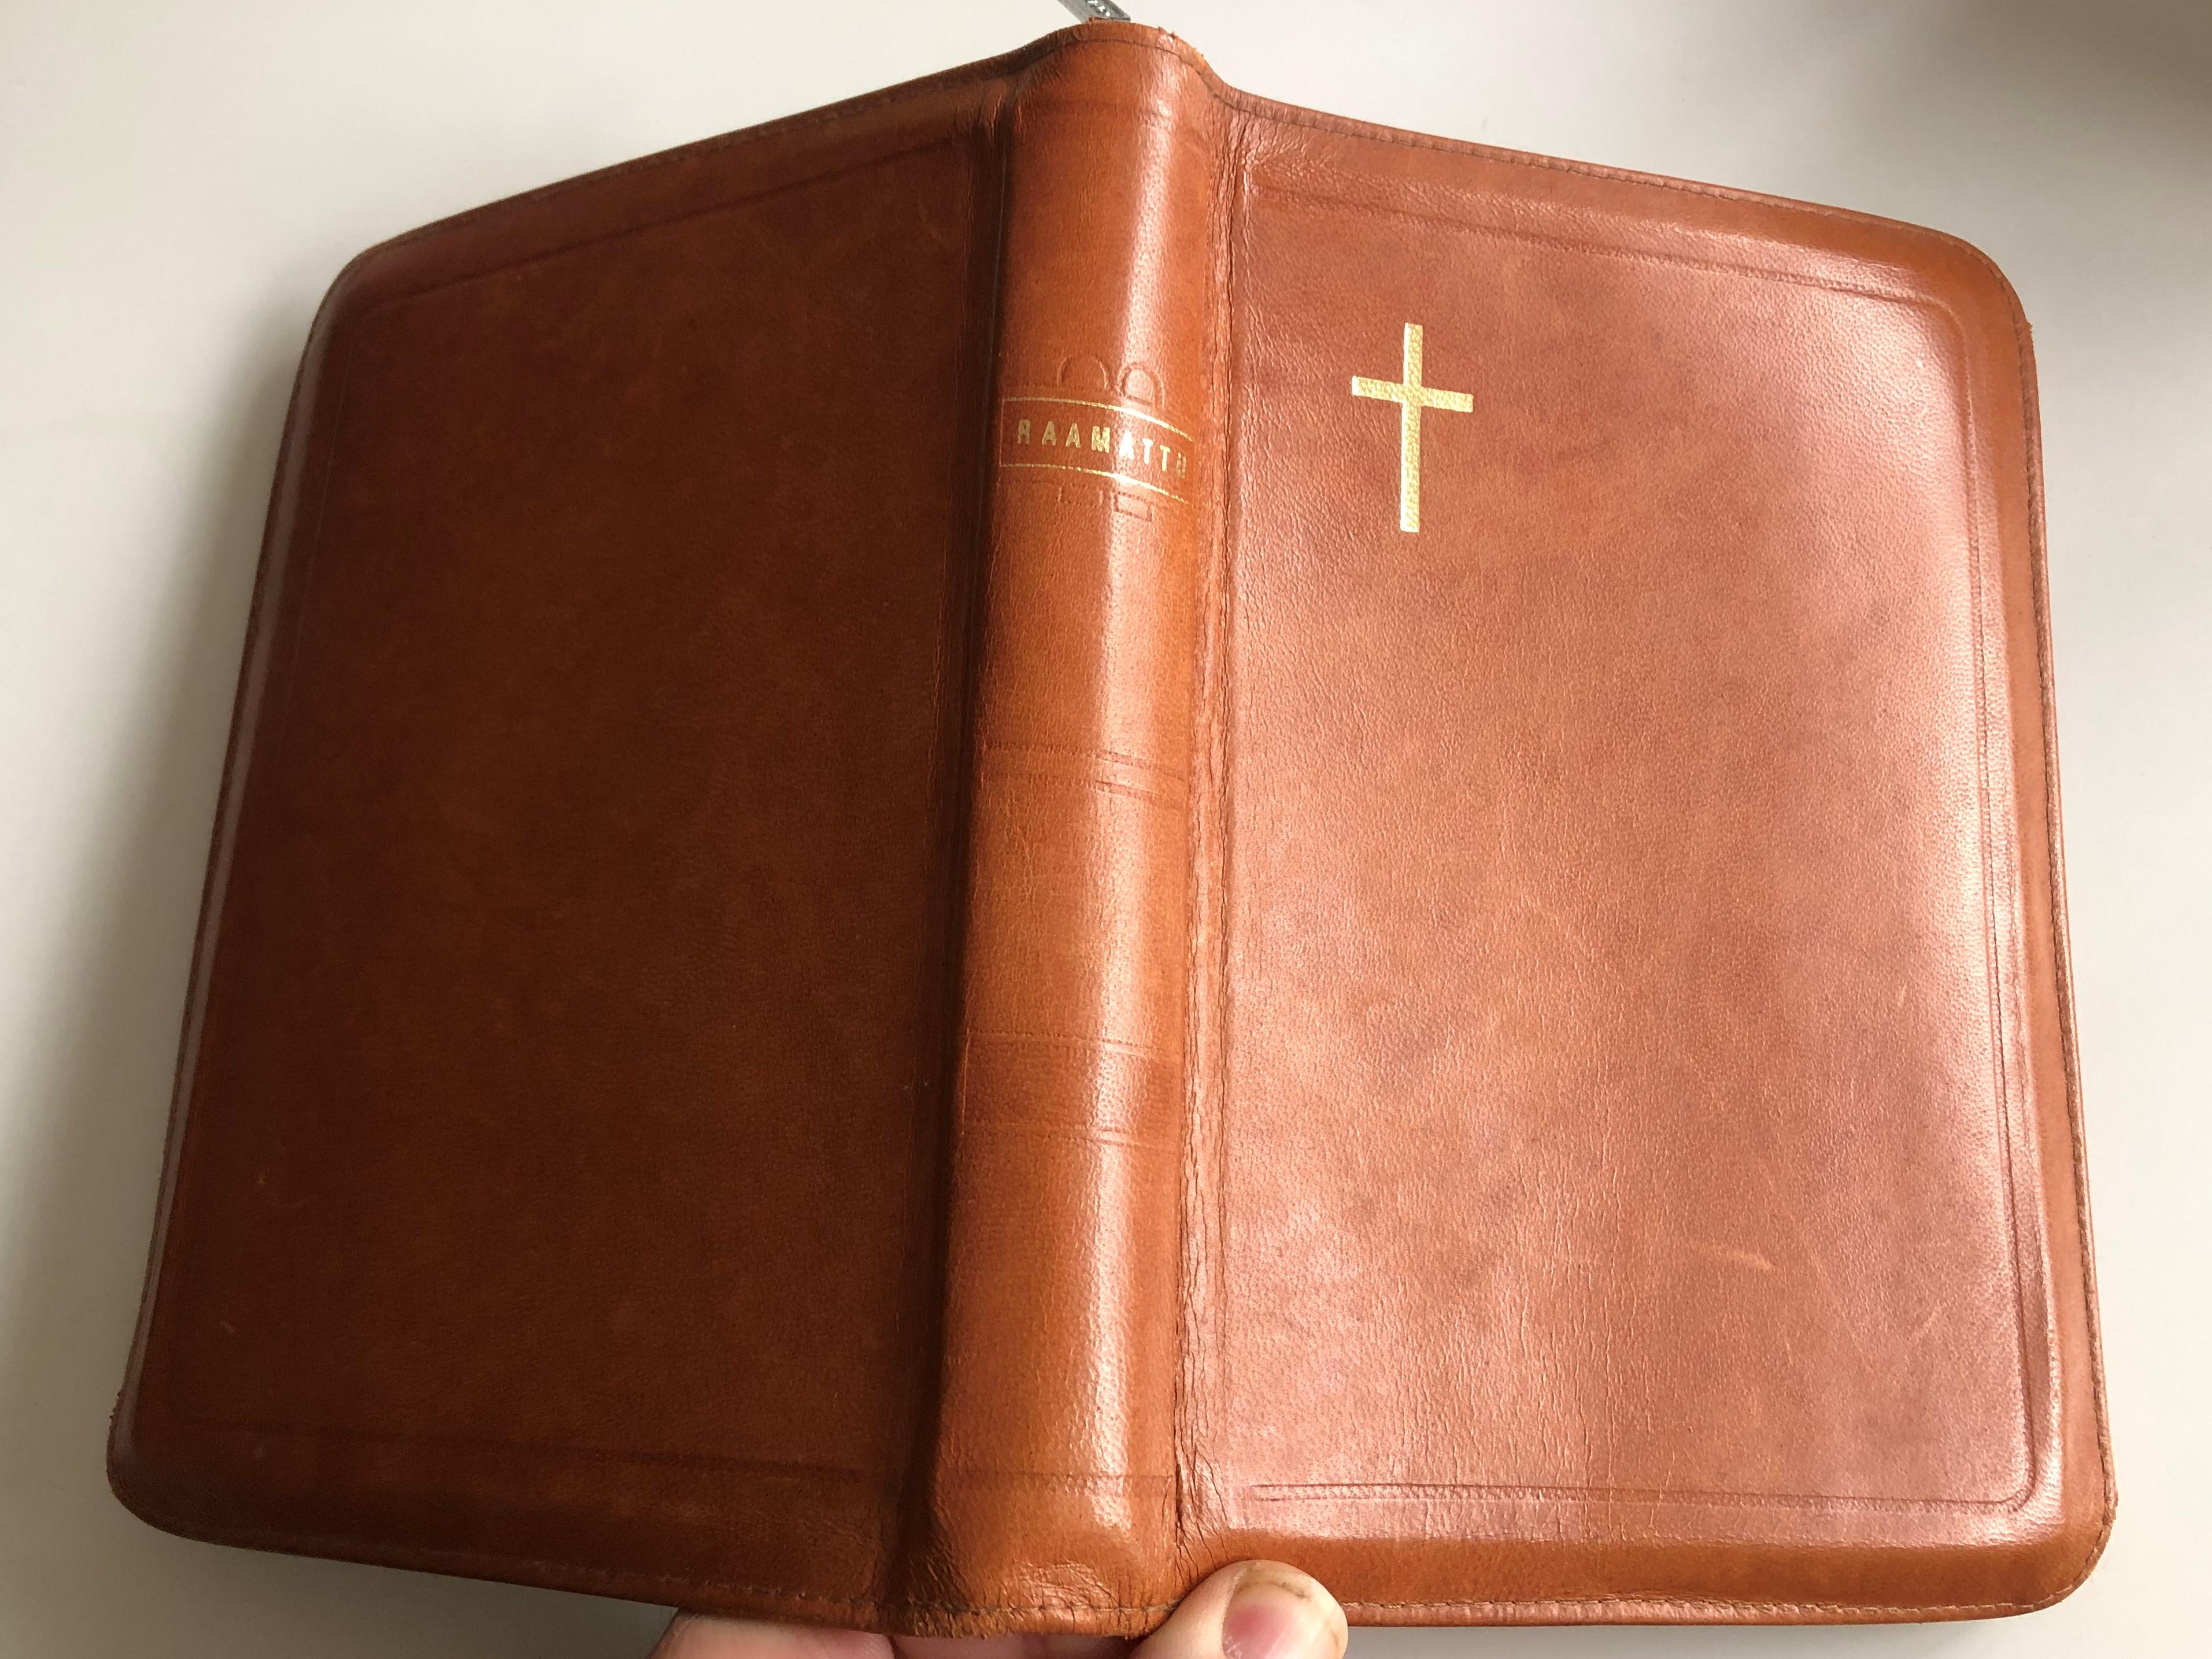 pyh-raamattu-finnish-language-brown-leather-bound-bible-23.jpg